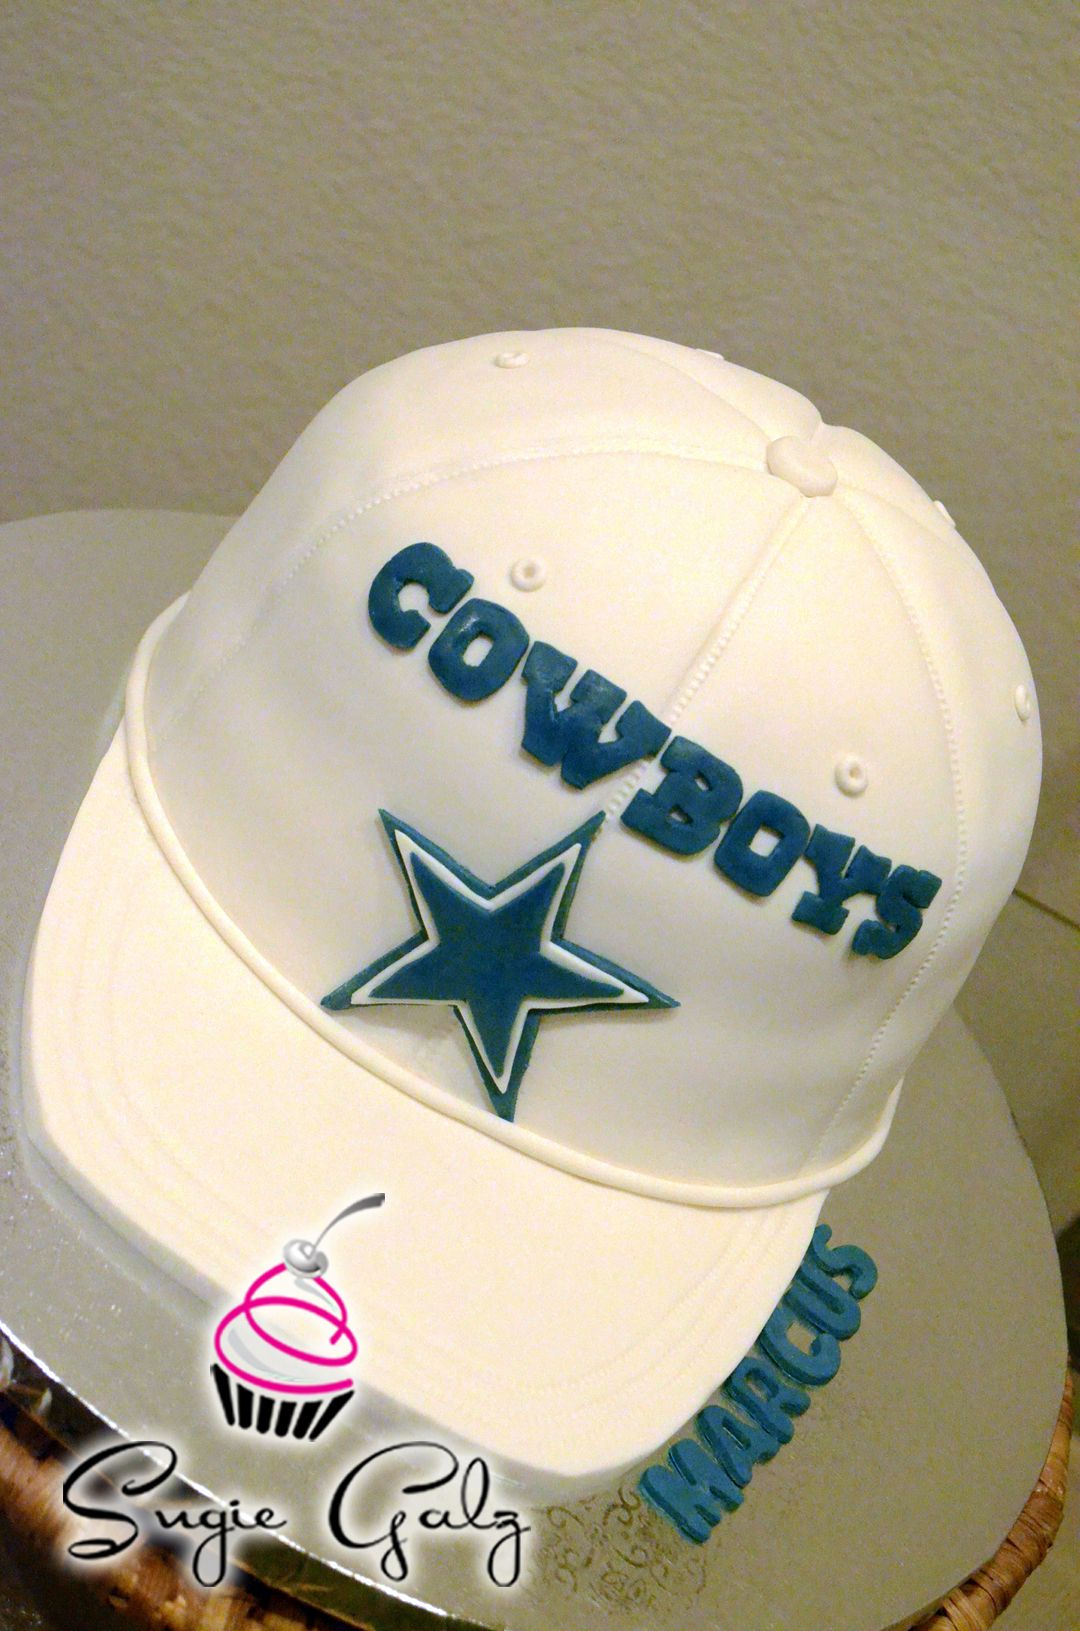 Dallas Cowboys Hat Birthday Cake By Sugie Galz in Austin Texas